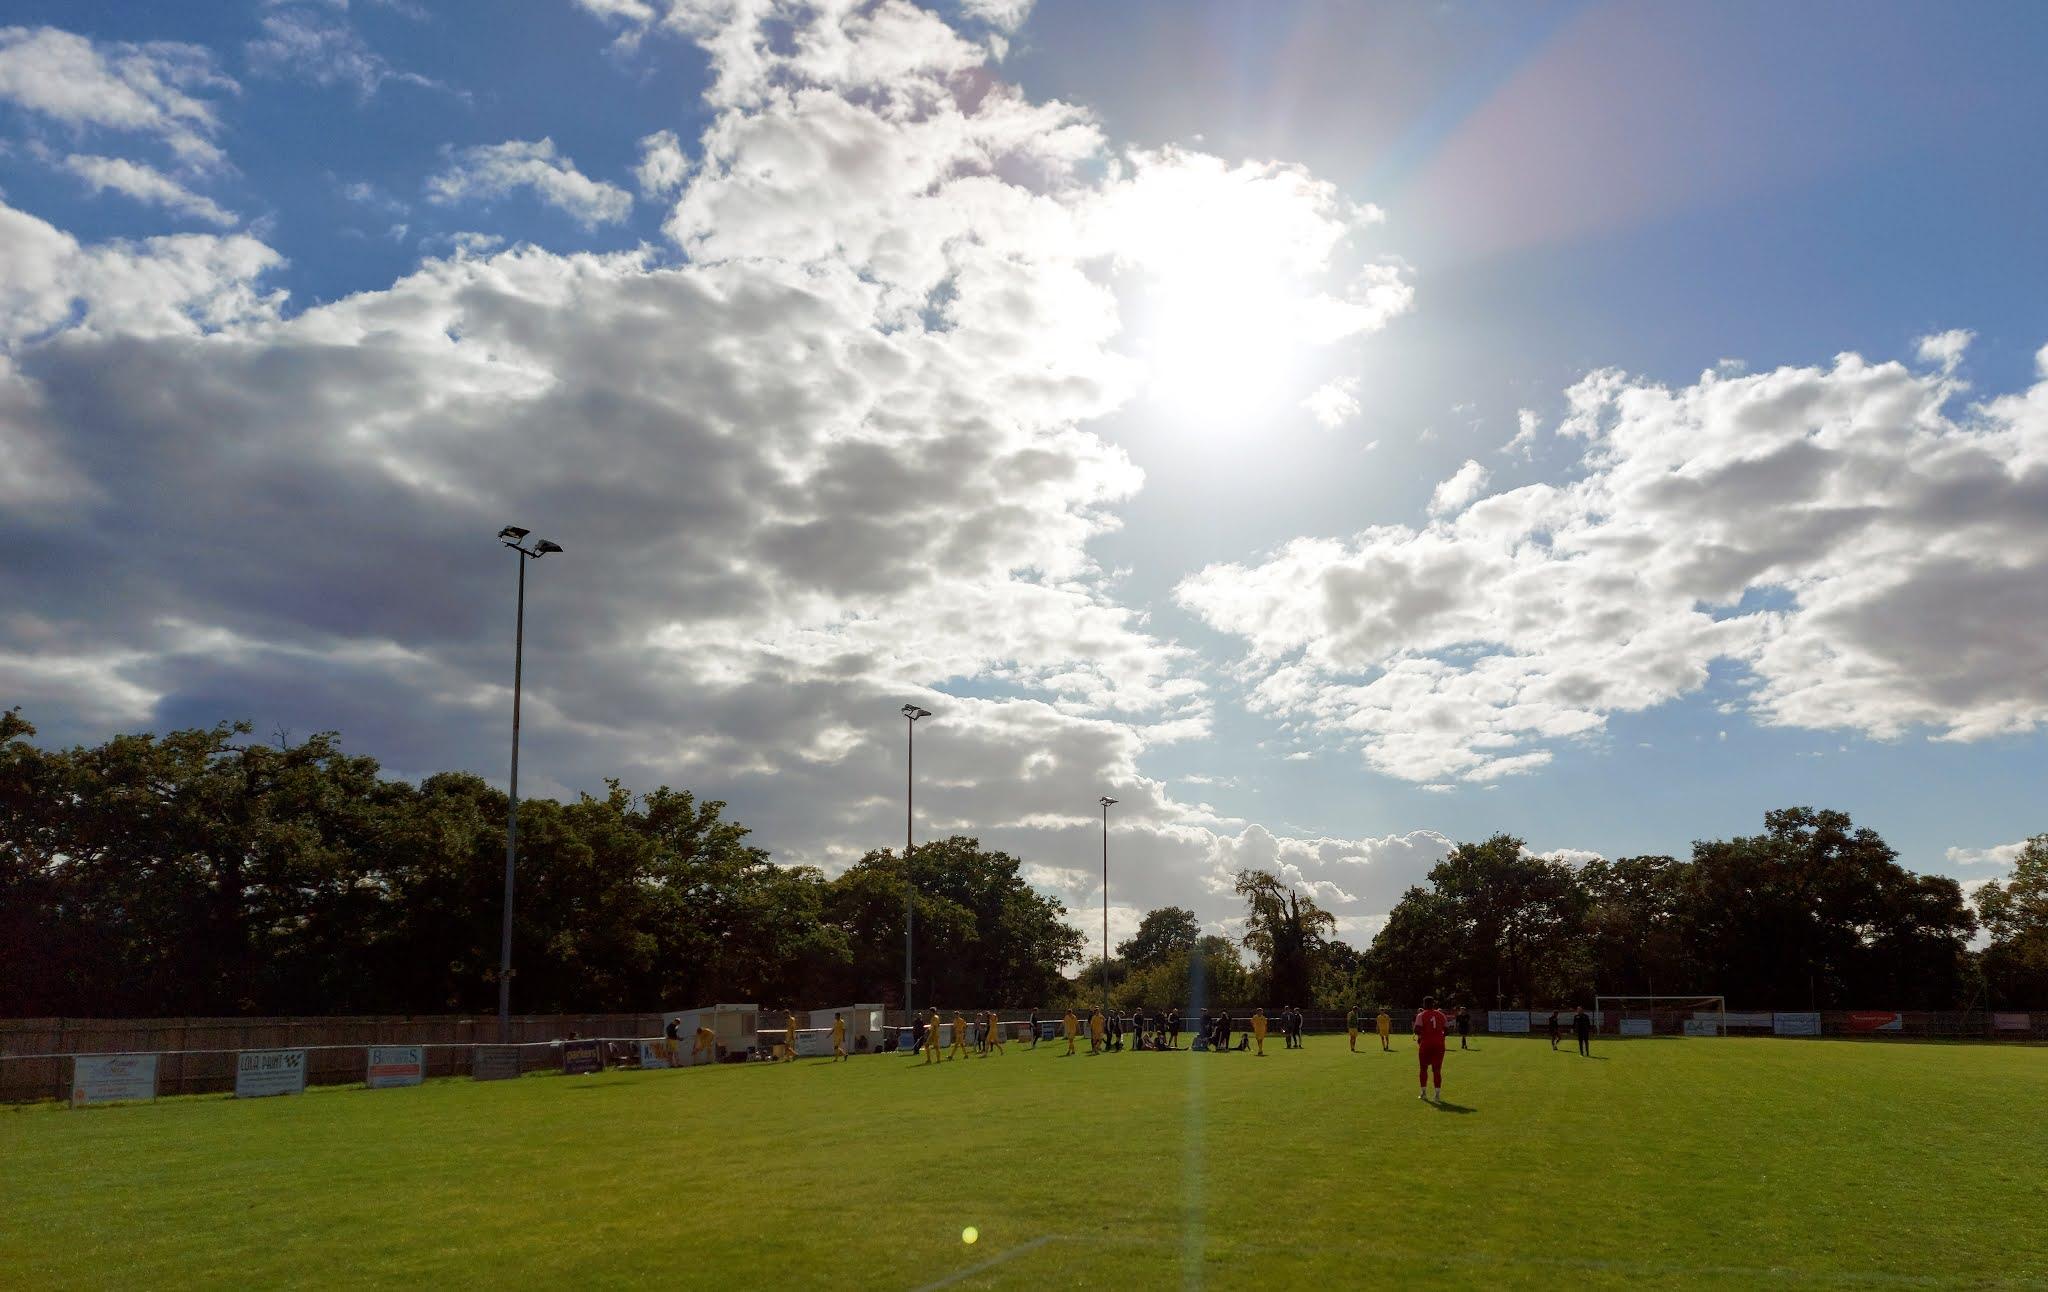 A look towards the dugouts at Barlow's Park